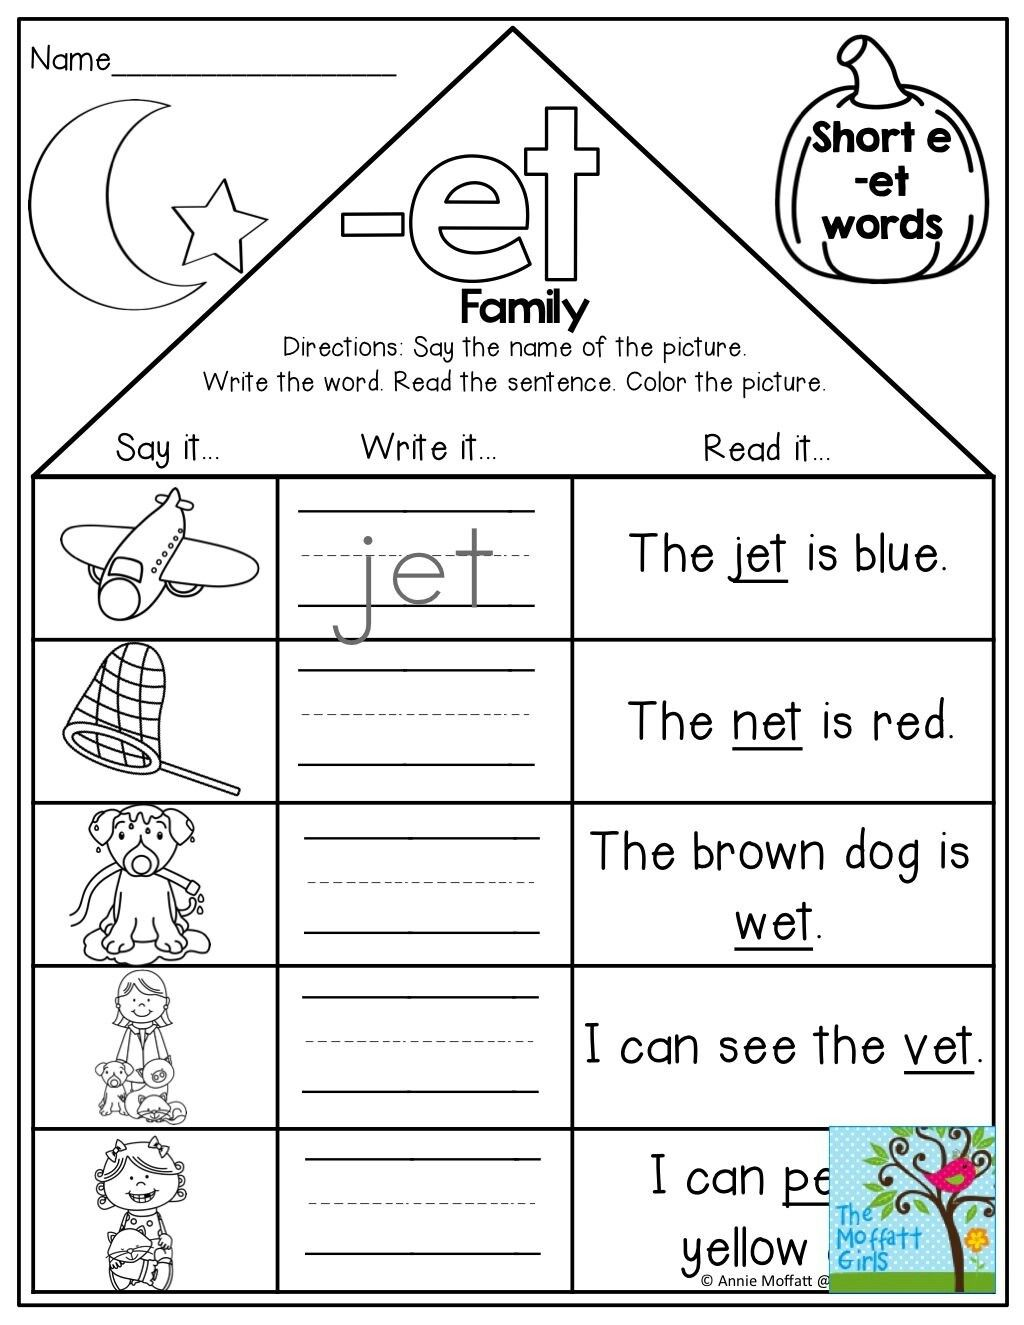 Pin By Lledo On Para El Cole Kindergarten Word Families Kindergarten Word Families Worksheets Word Family Worksheets [ 1325 x 1024 Pixel ]